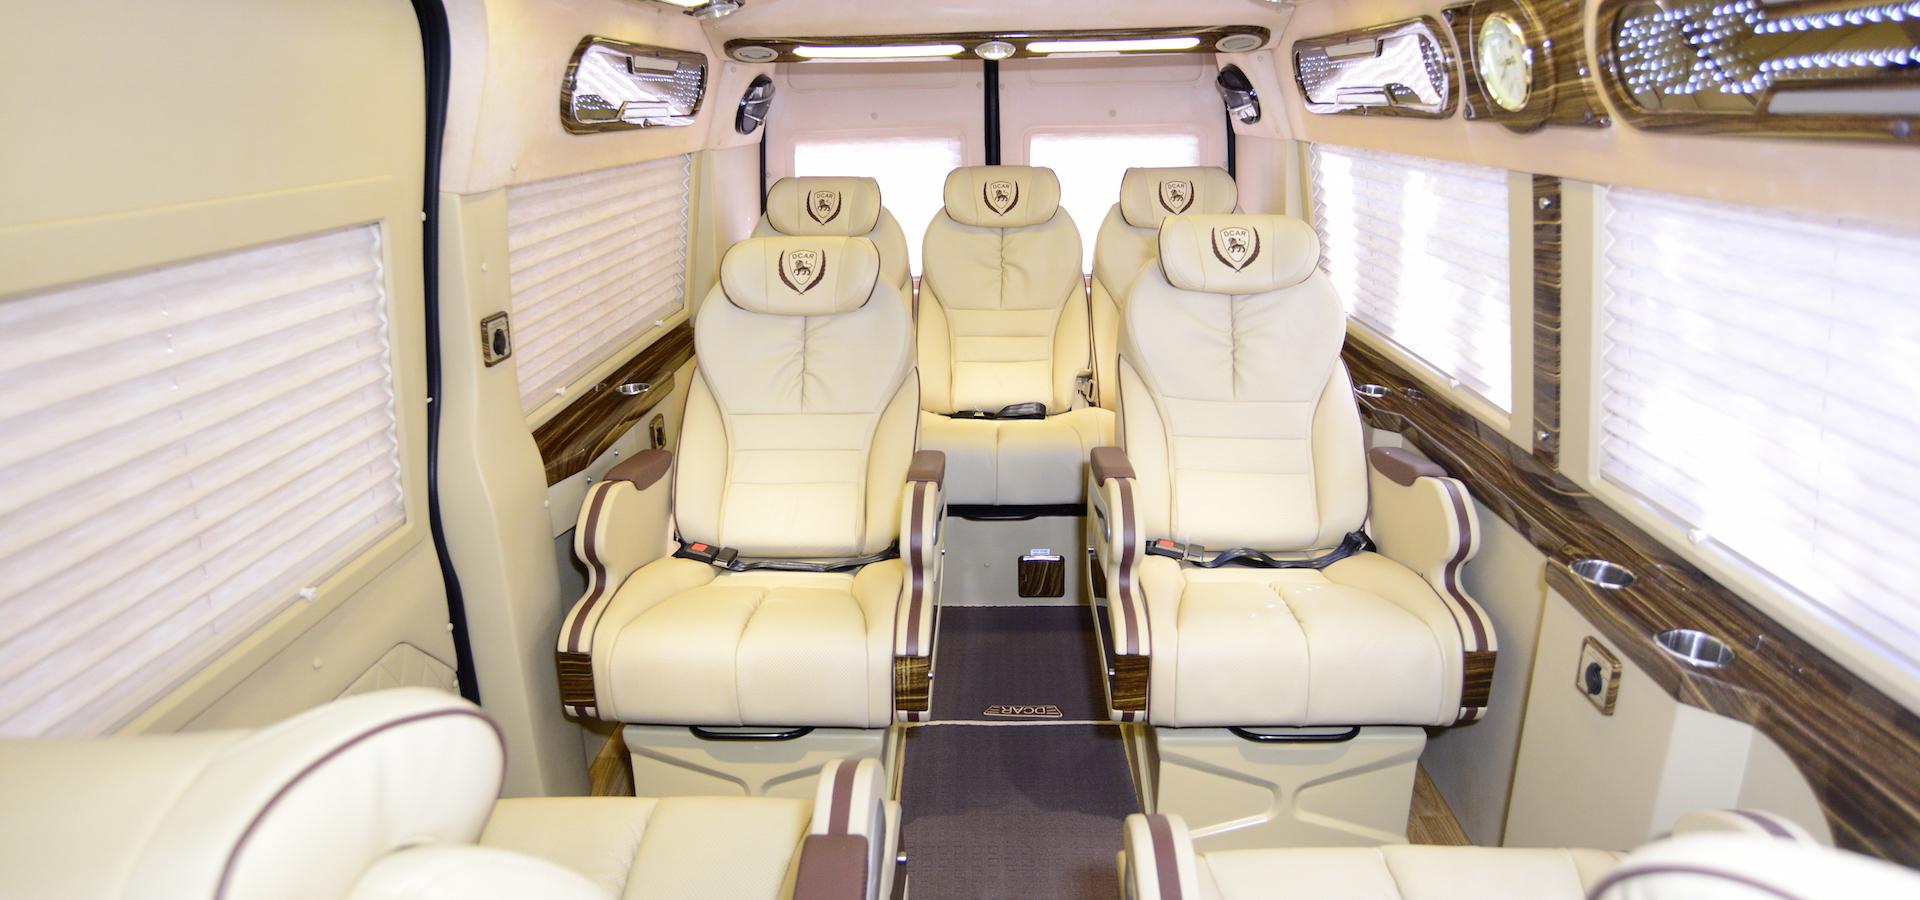 Ford Transit Dcar Limousine 2021 (Bản 10 chỗ)2